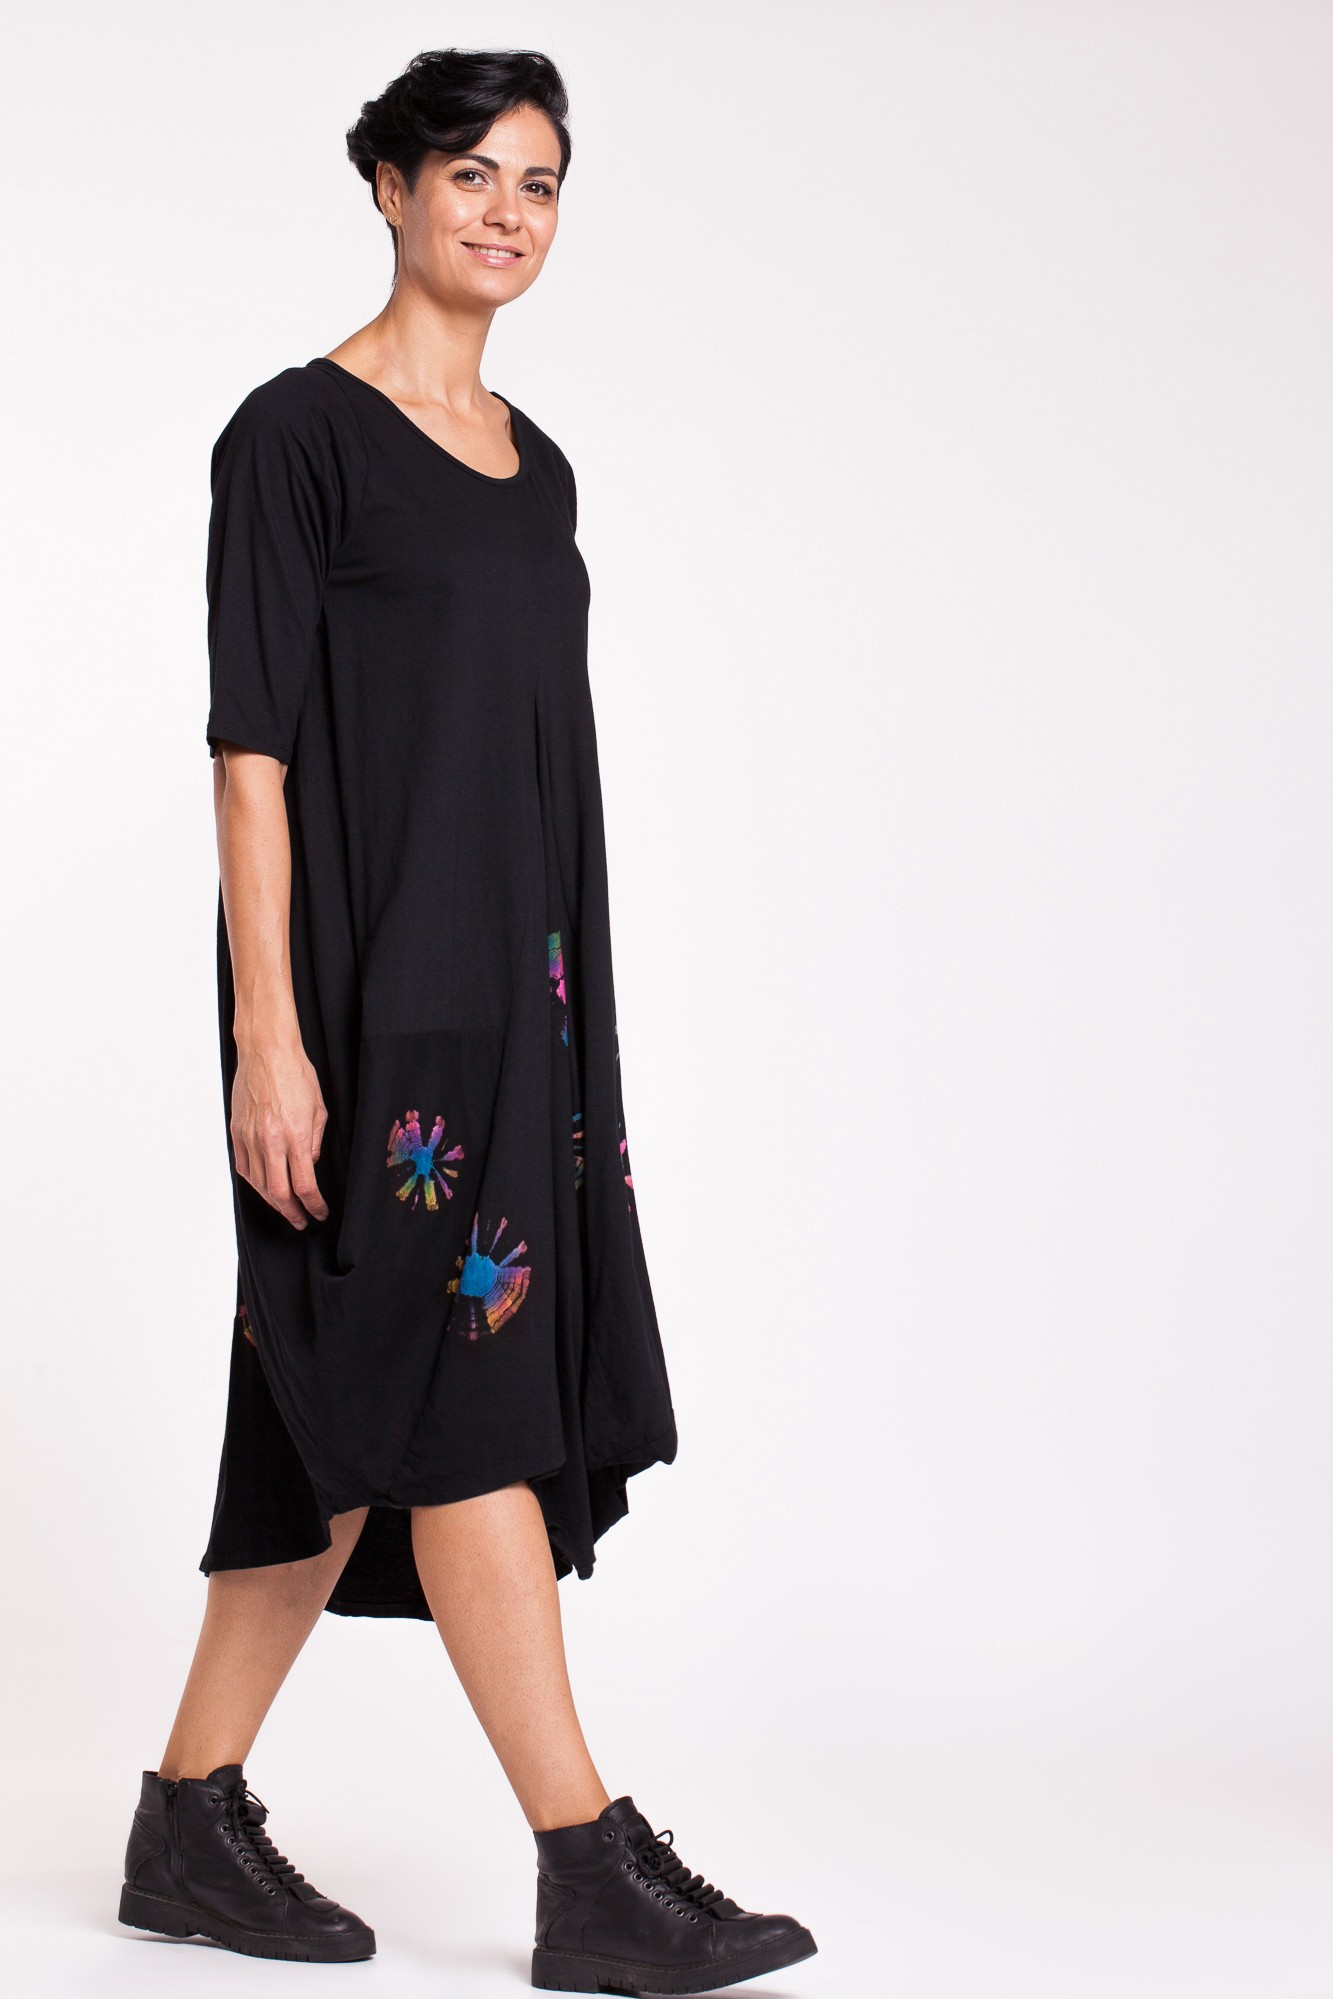 Rochie neagra din bumbac cu flori Tye-Dye